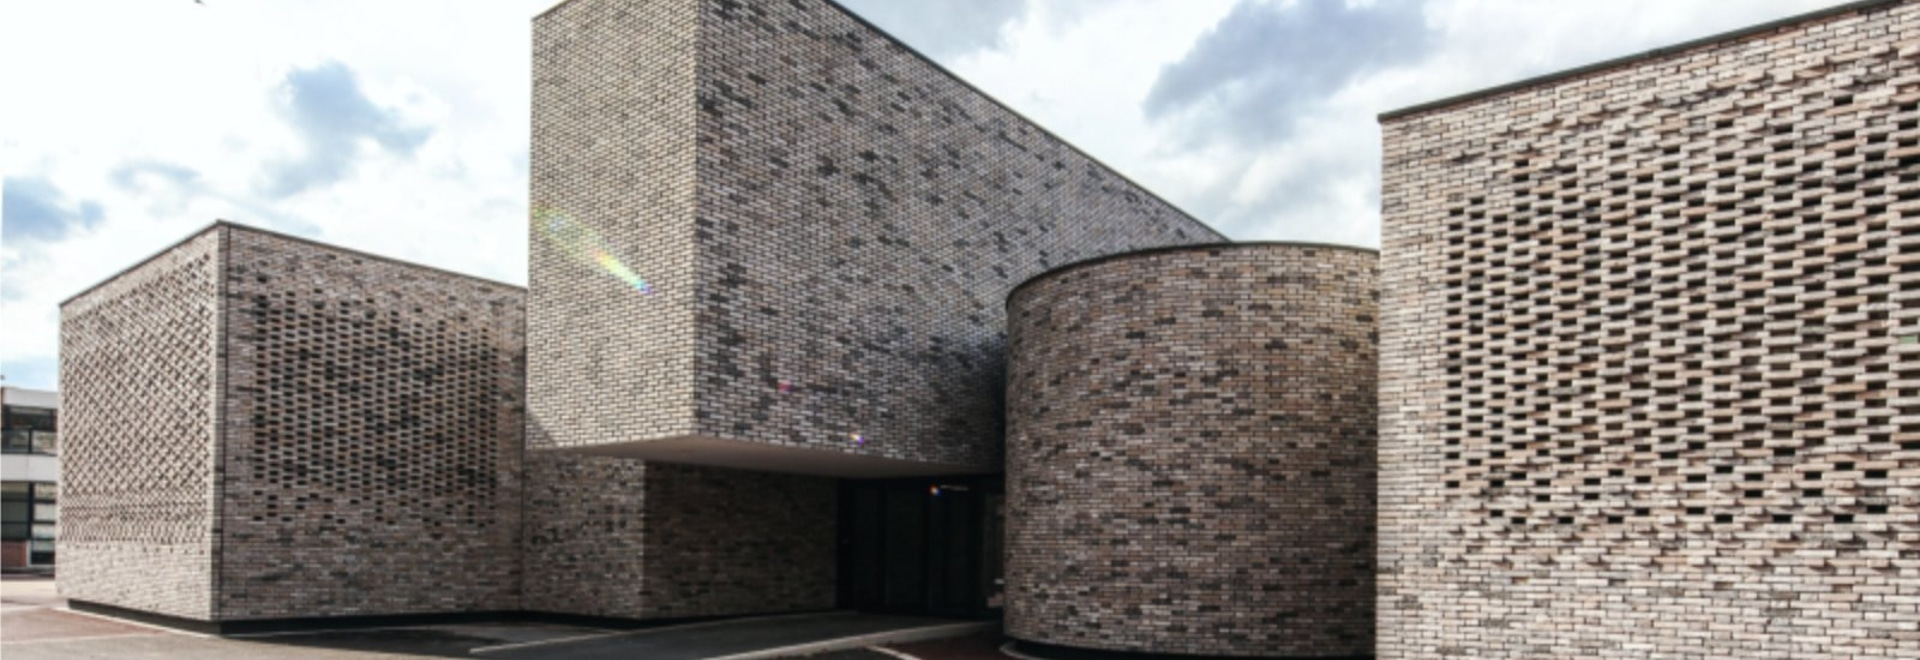 Escuela de Música Elancourt de OPUS 5 Architectes